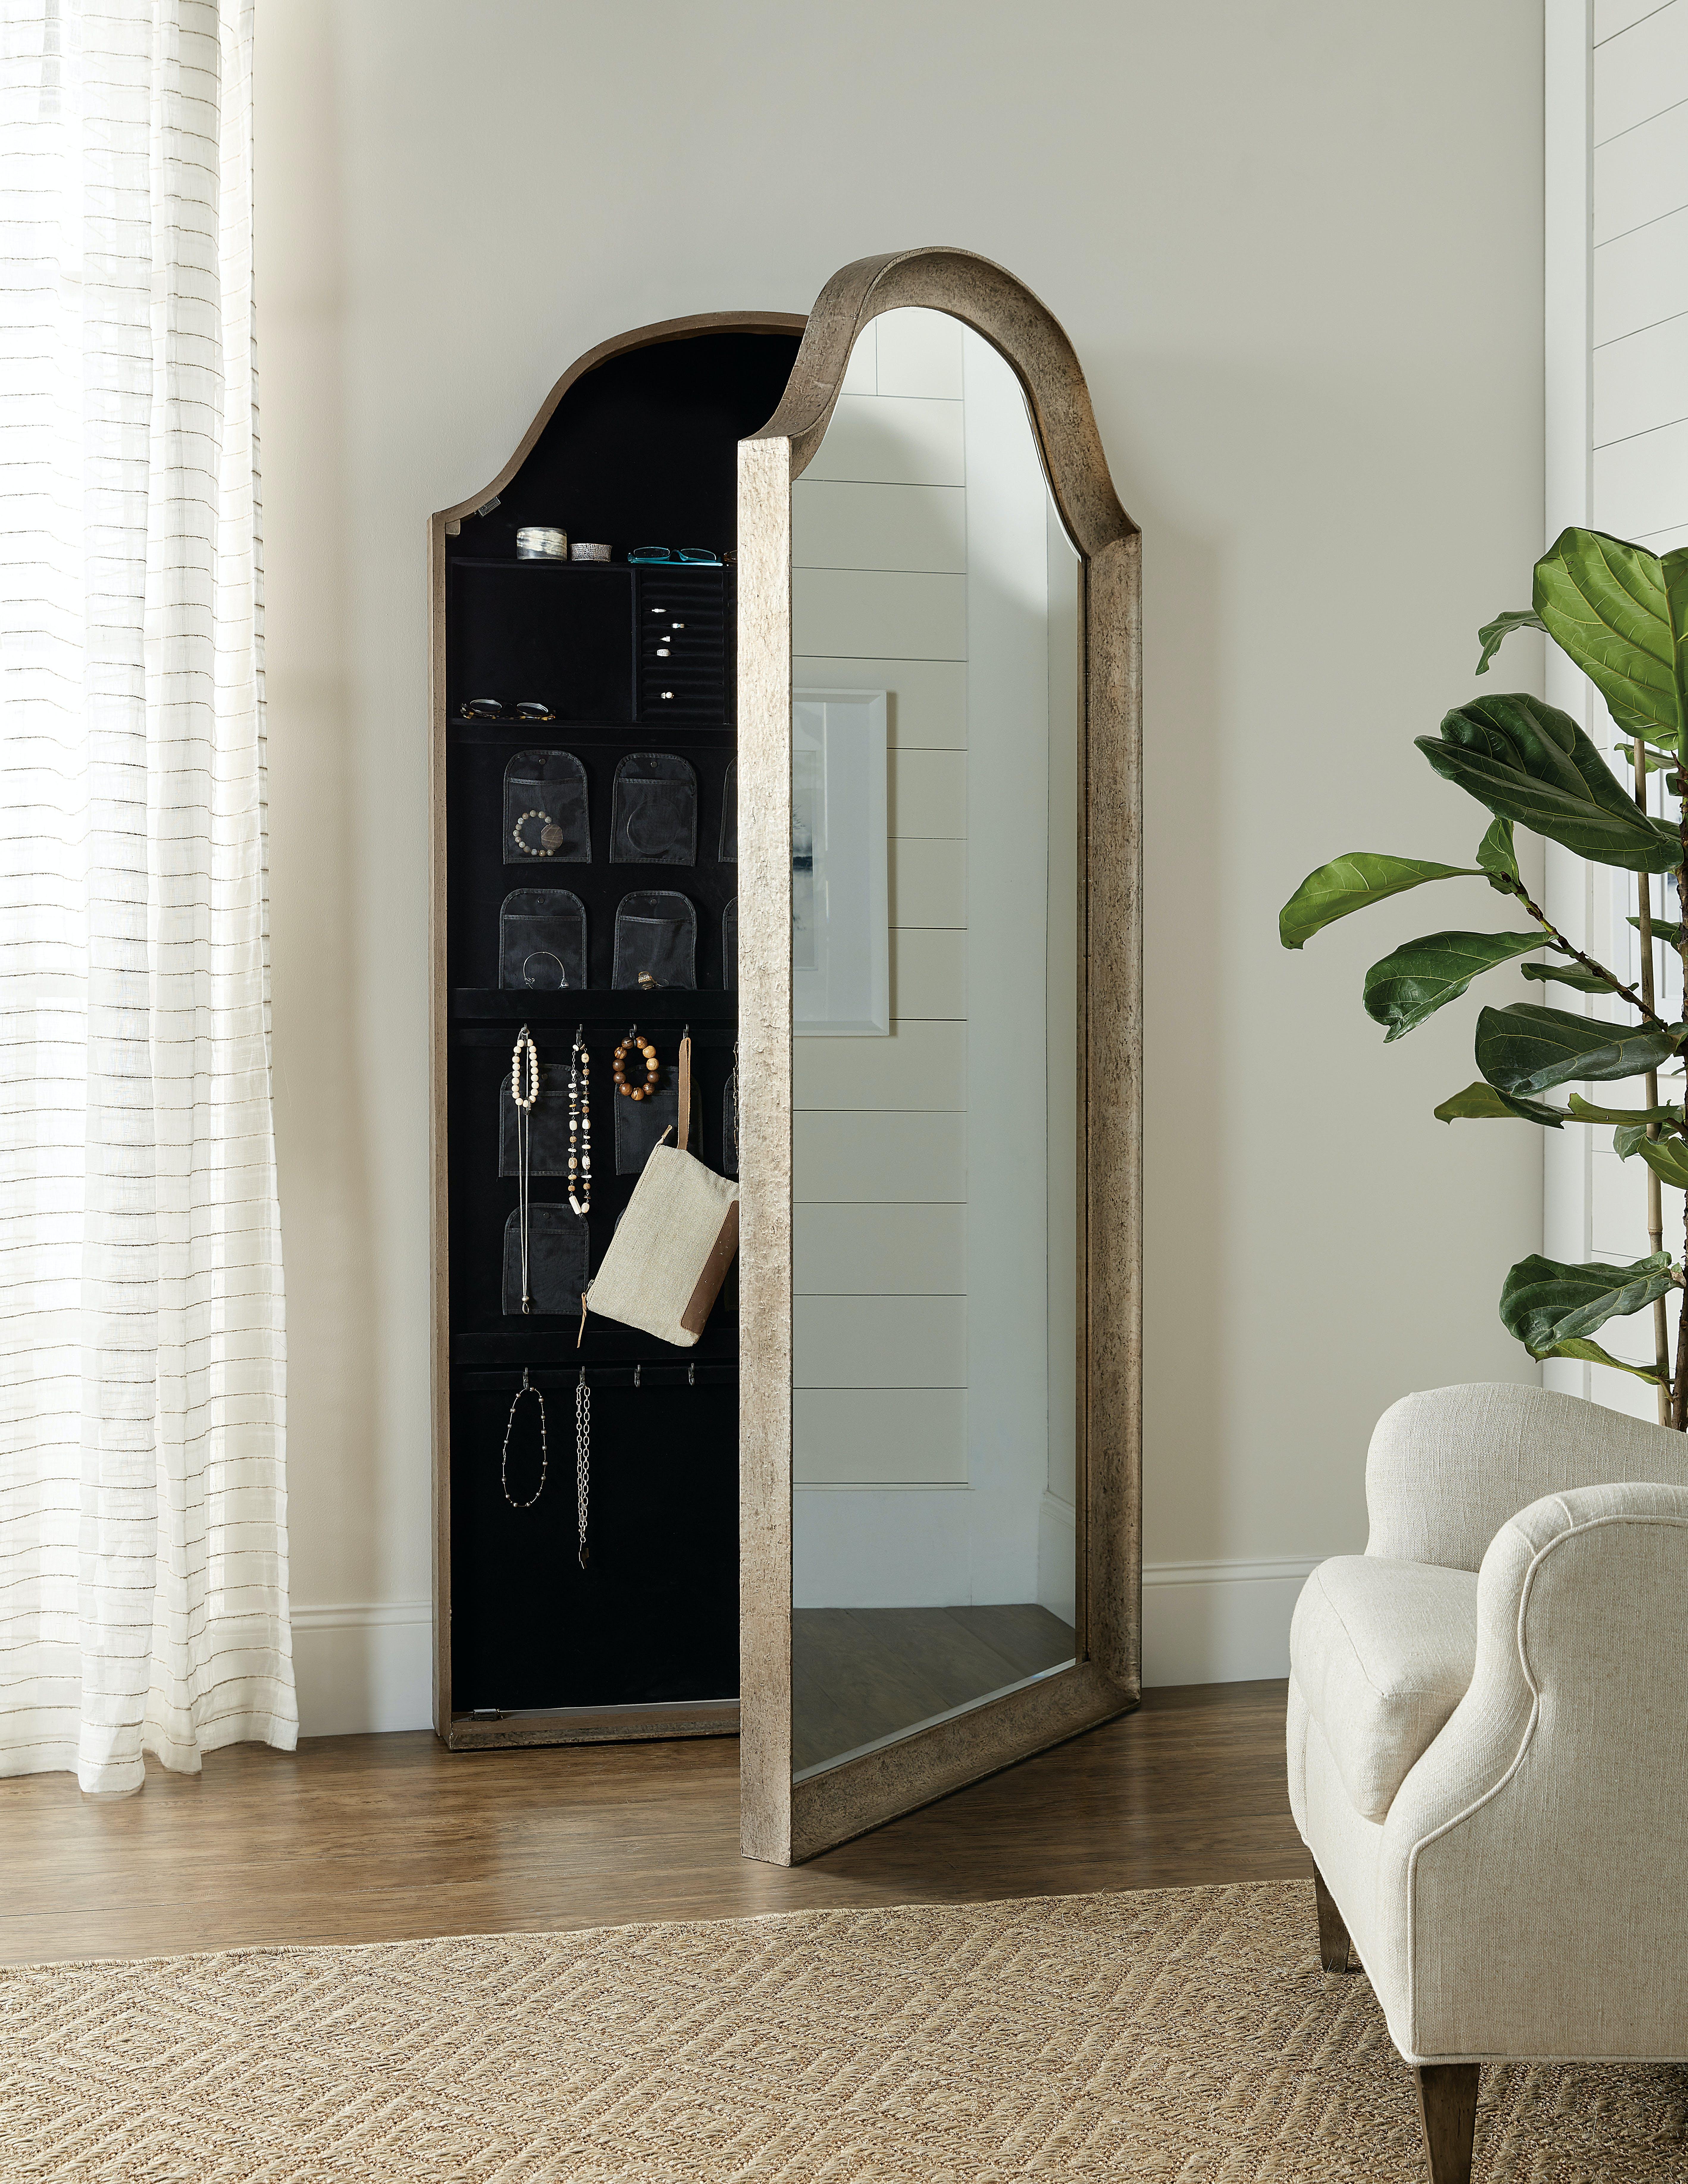 Hooker Furniture Accessories Alfresco Paradiso Floor Mirror W Jewelry Storage 6025 50004 85 Wenz